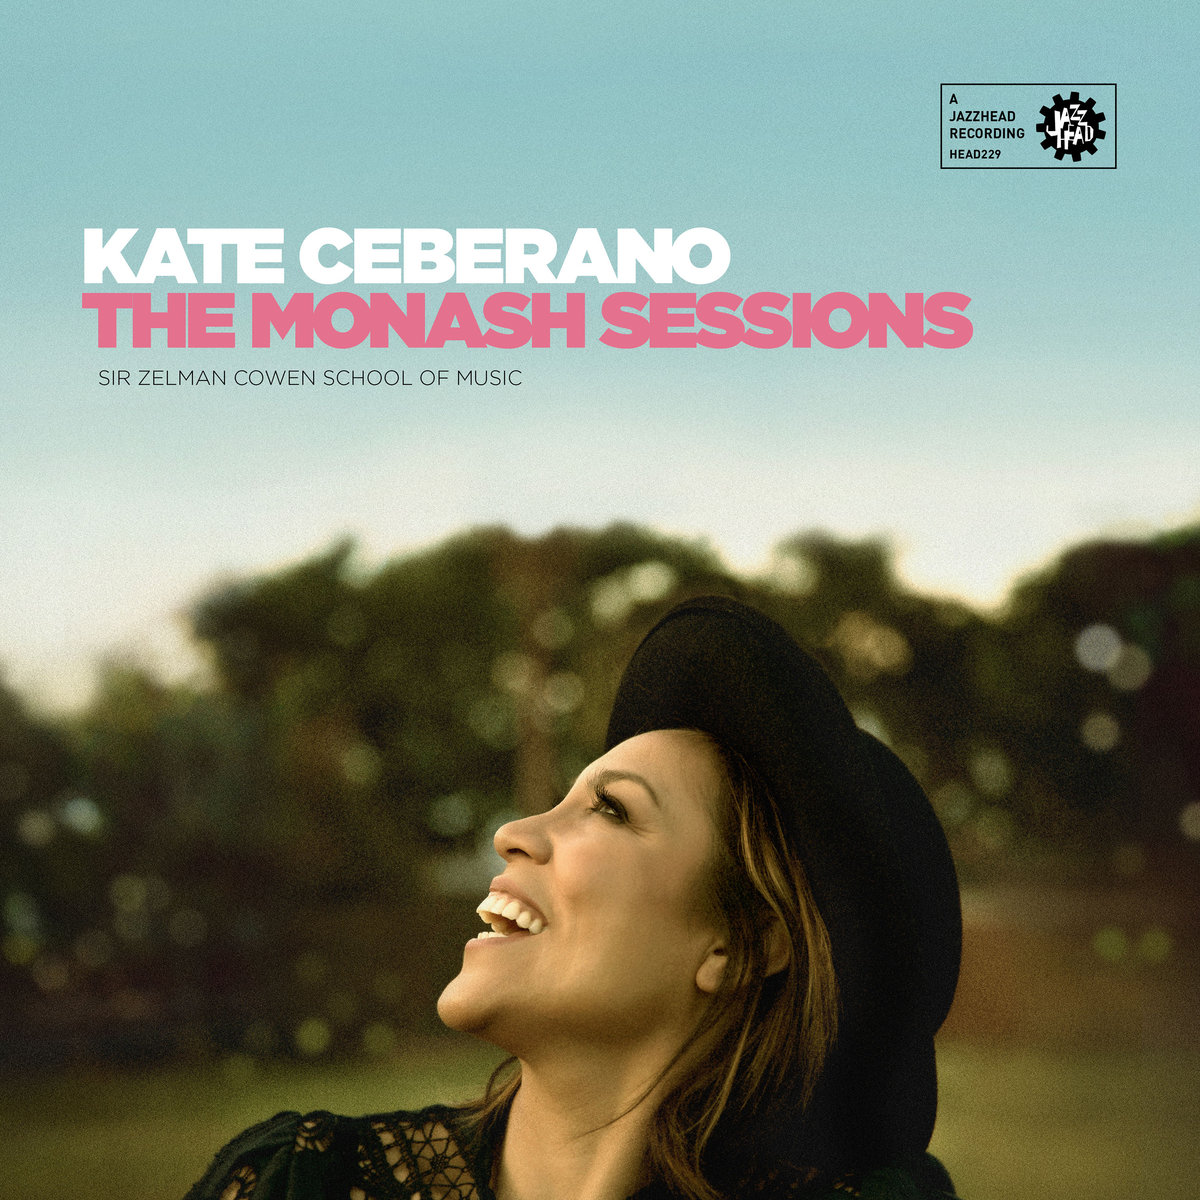 Kate Ceberano - The Monash Sessions